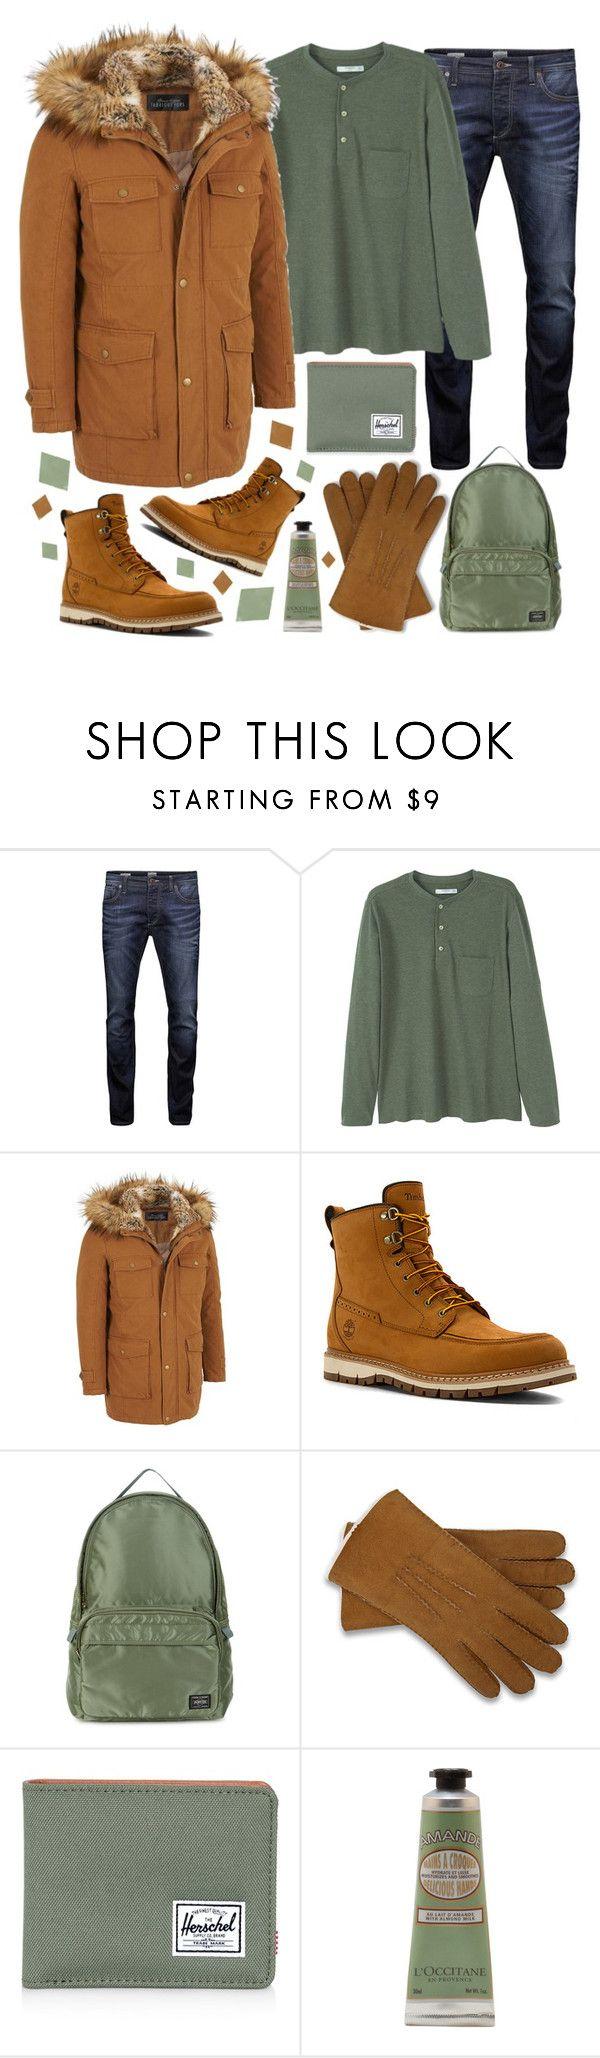 """Timberland Boots!"" by sanela-enter ❤ liked on Polyvore featuring Jack & Jones, MANGO MAN, Timberland, Porter, UGG Australia, Herschel Supply Co., L'Occitane, men's fashion and menswear"